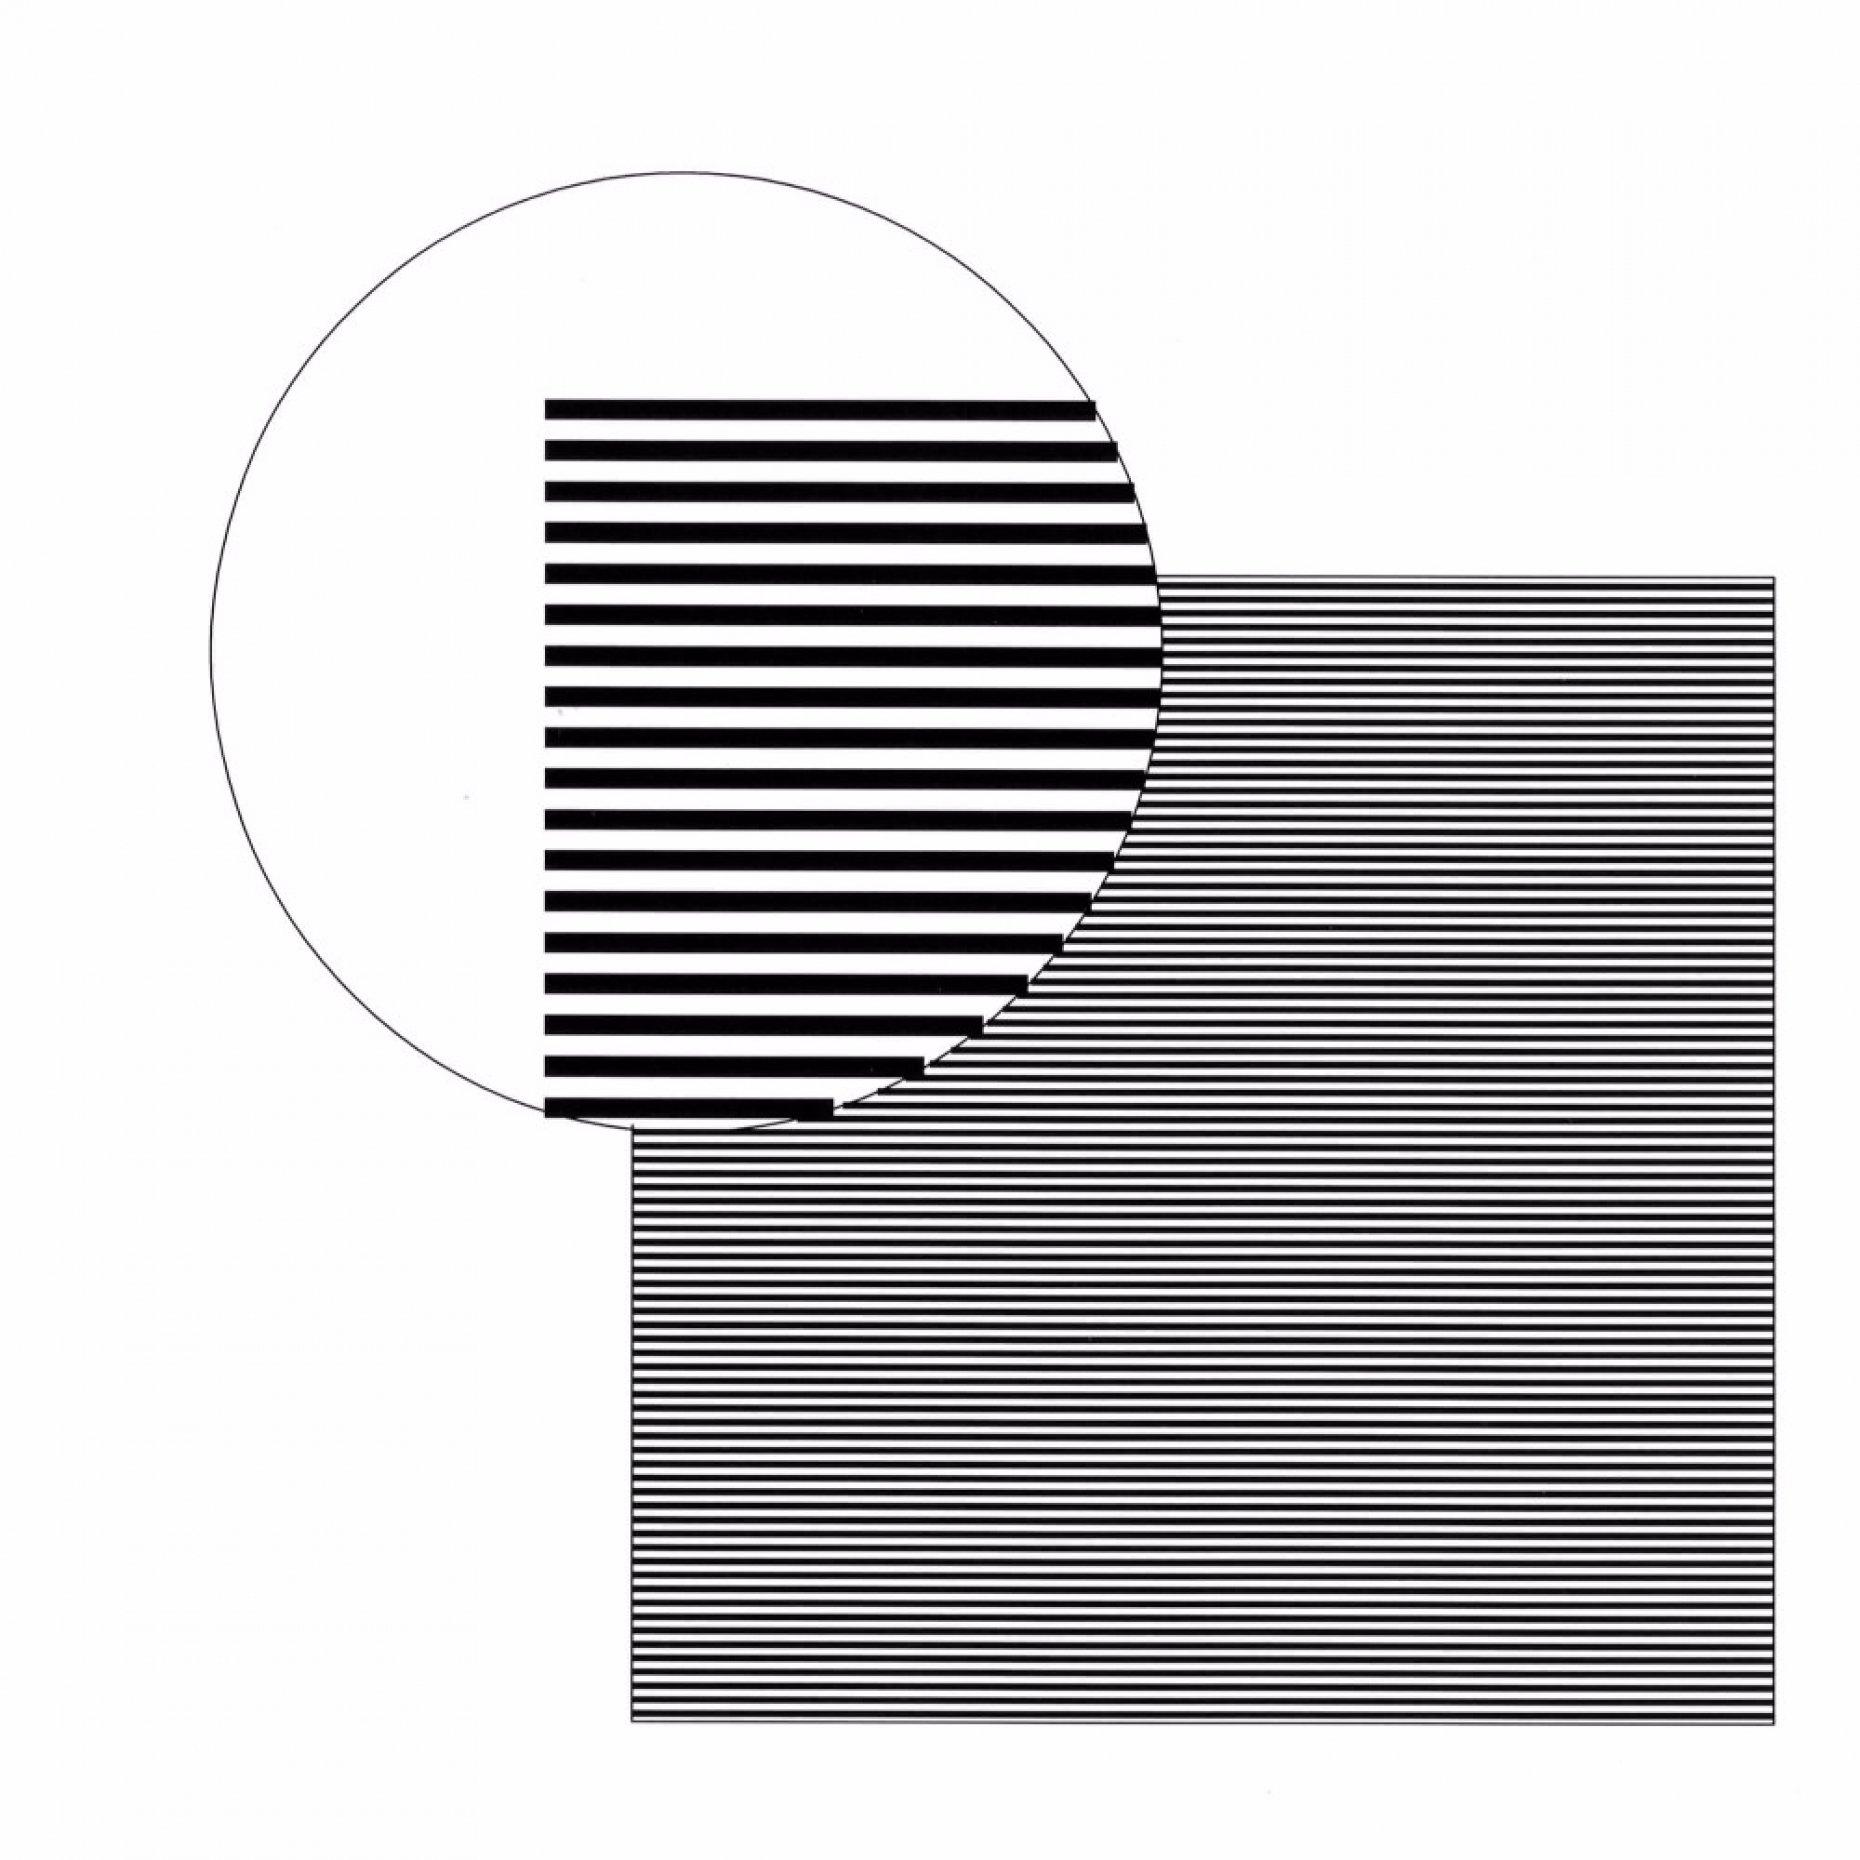 ATS02 Horizontal 12mm Lines DIN 52305 Pattern